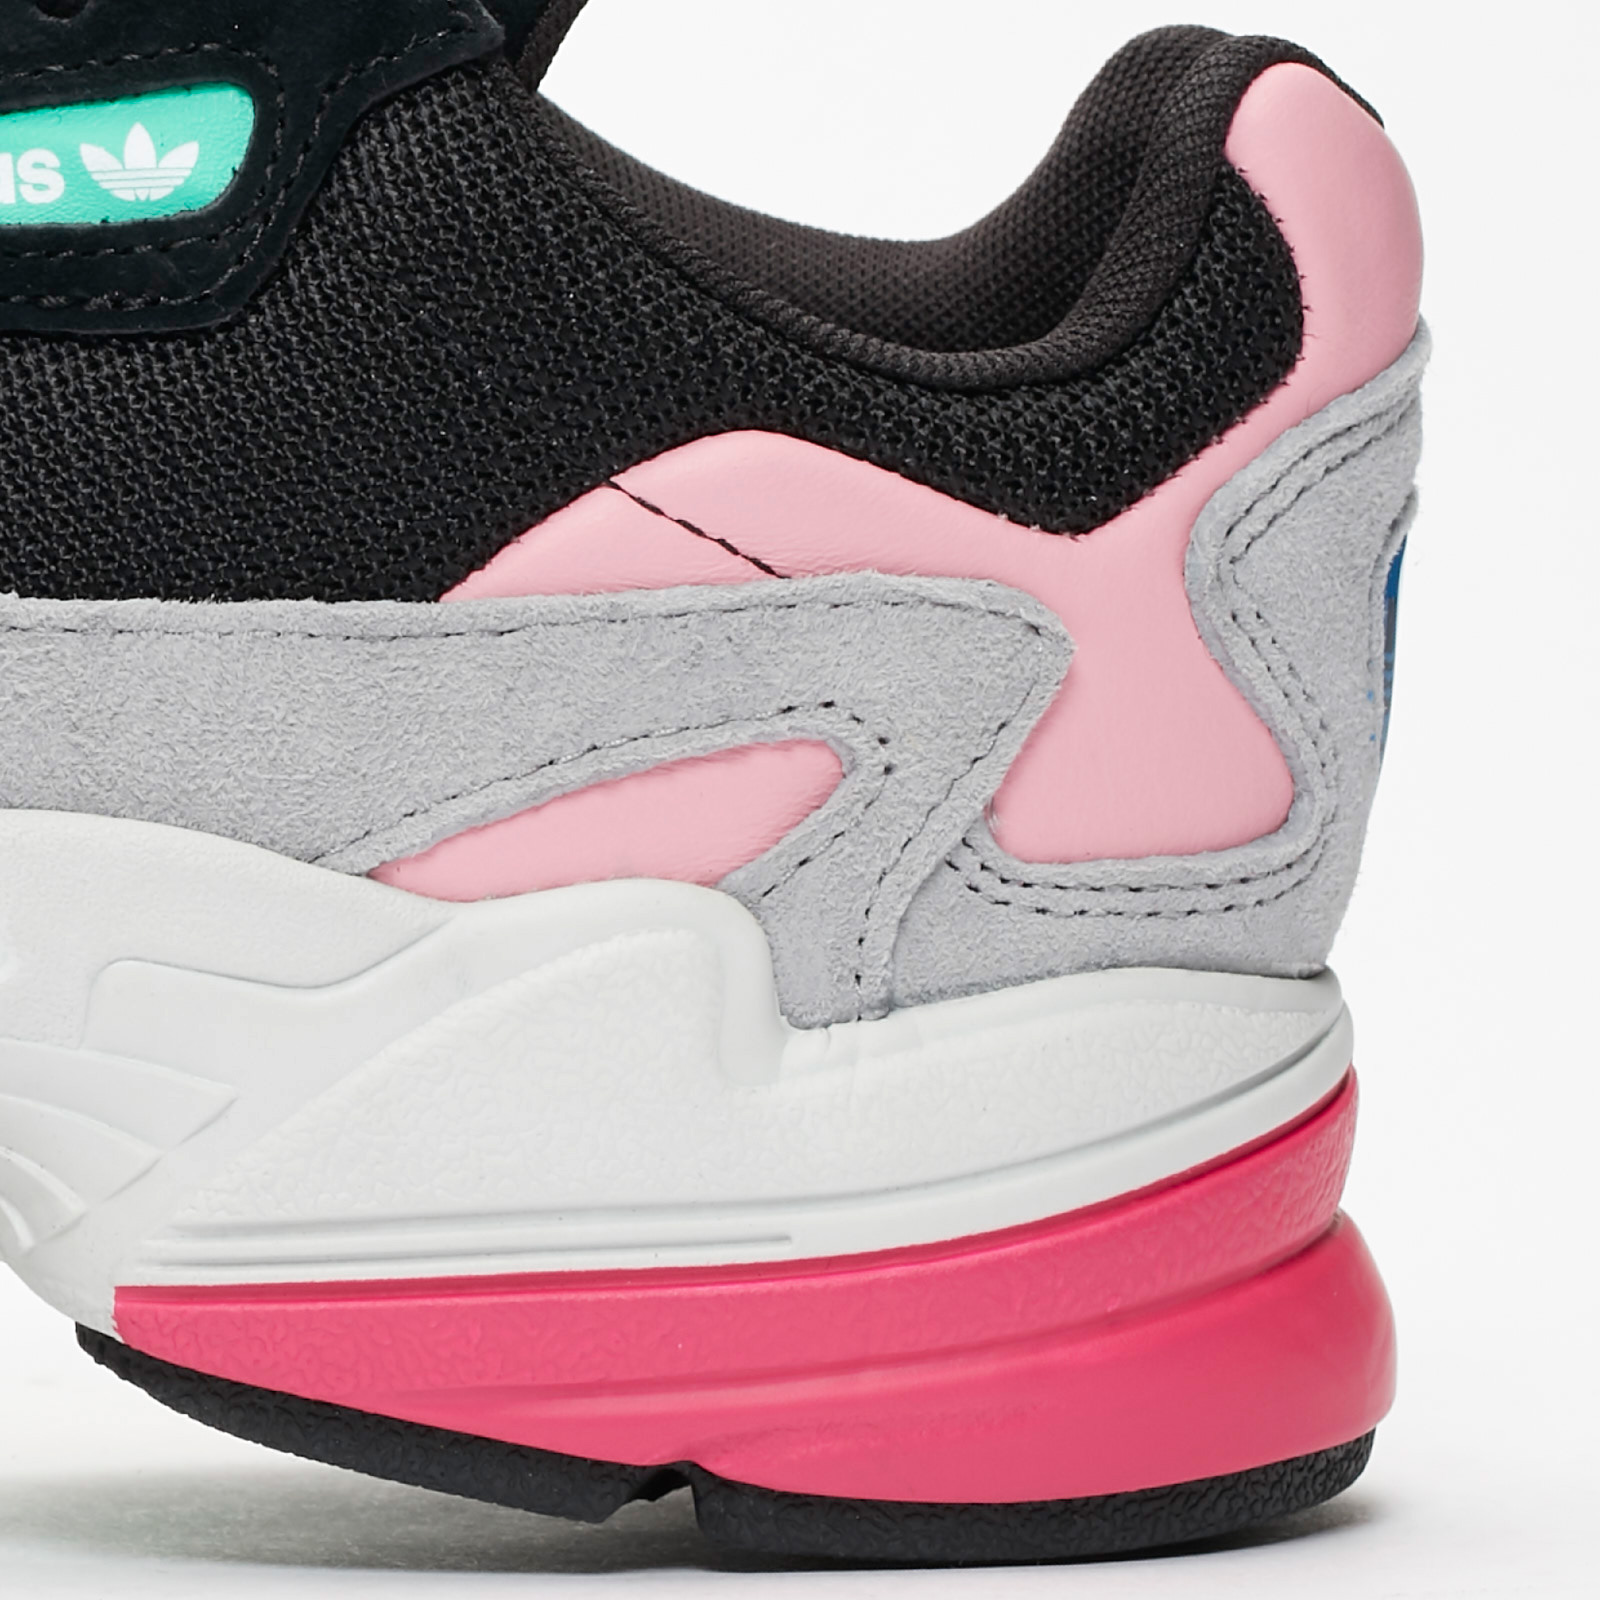 sports shoes 774b3 6b7c7 ... adidas Originals Falcon W ...